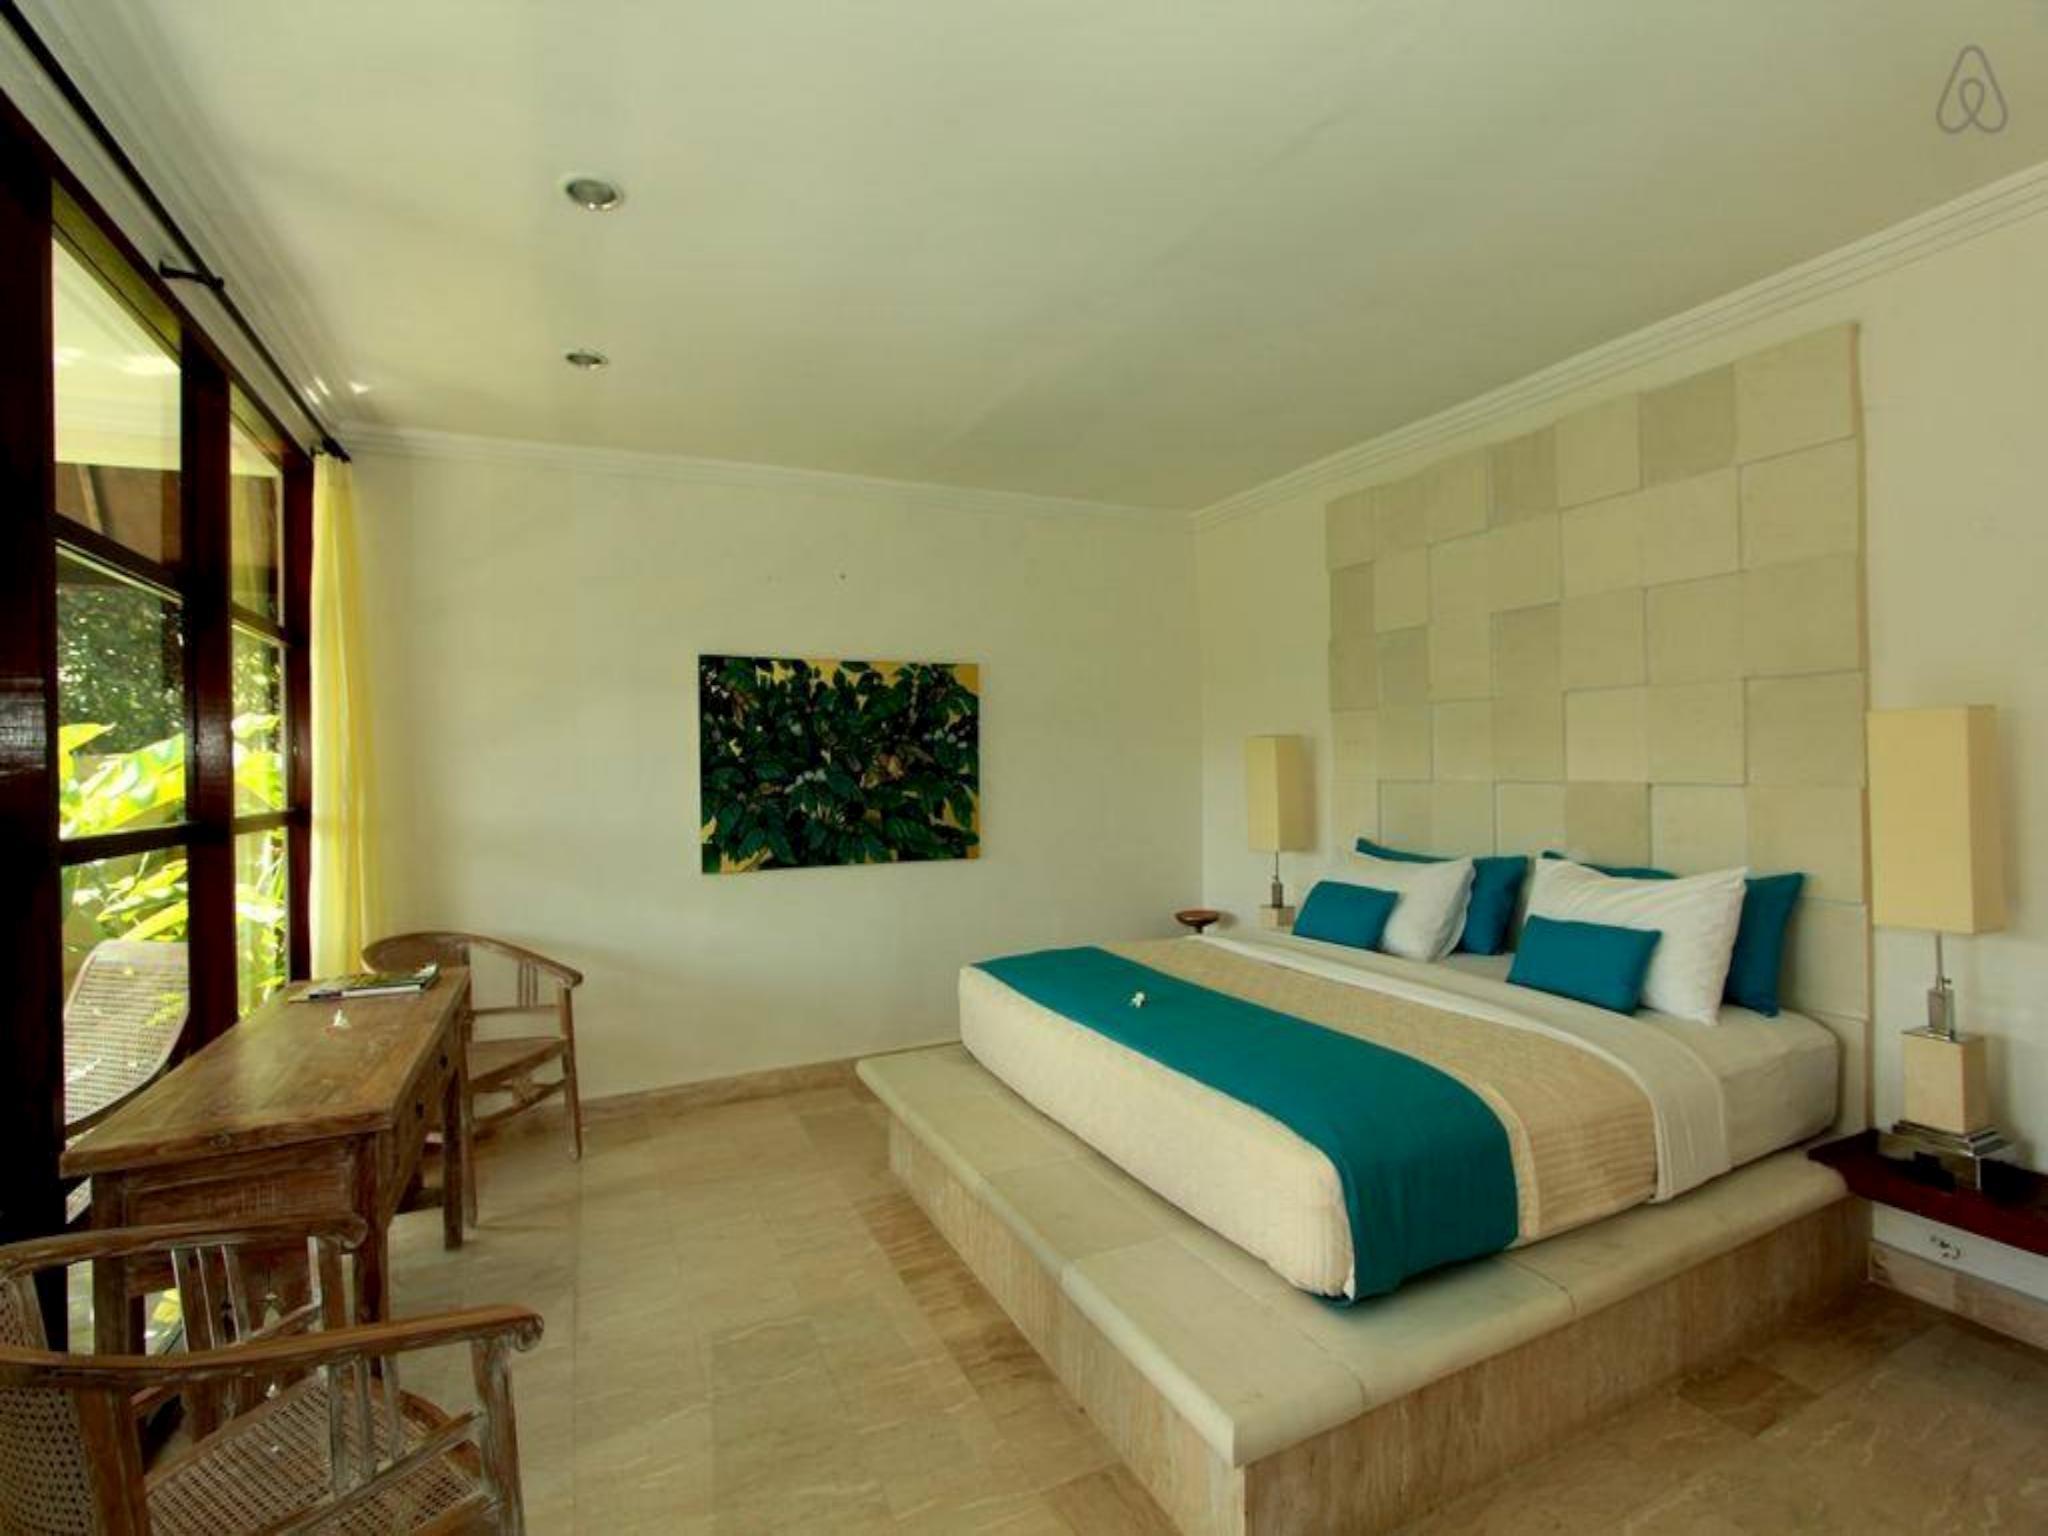 1 Bedroom Bungalow Sunset Hill Ubud